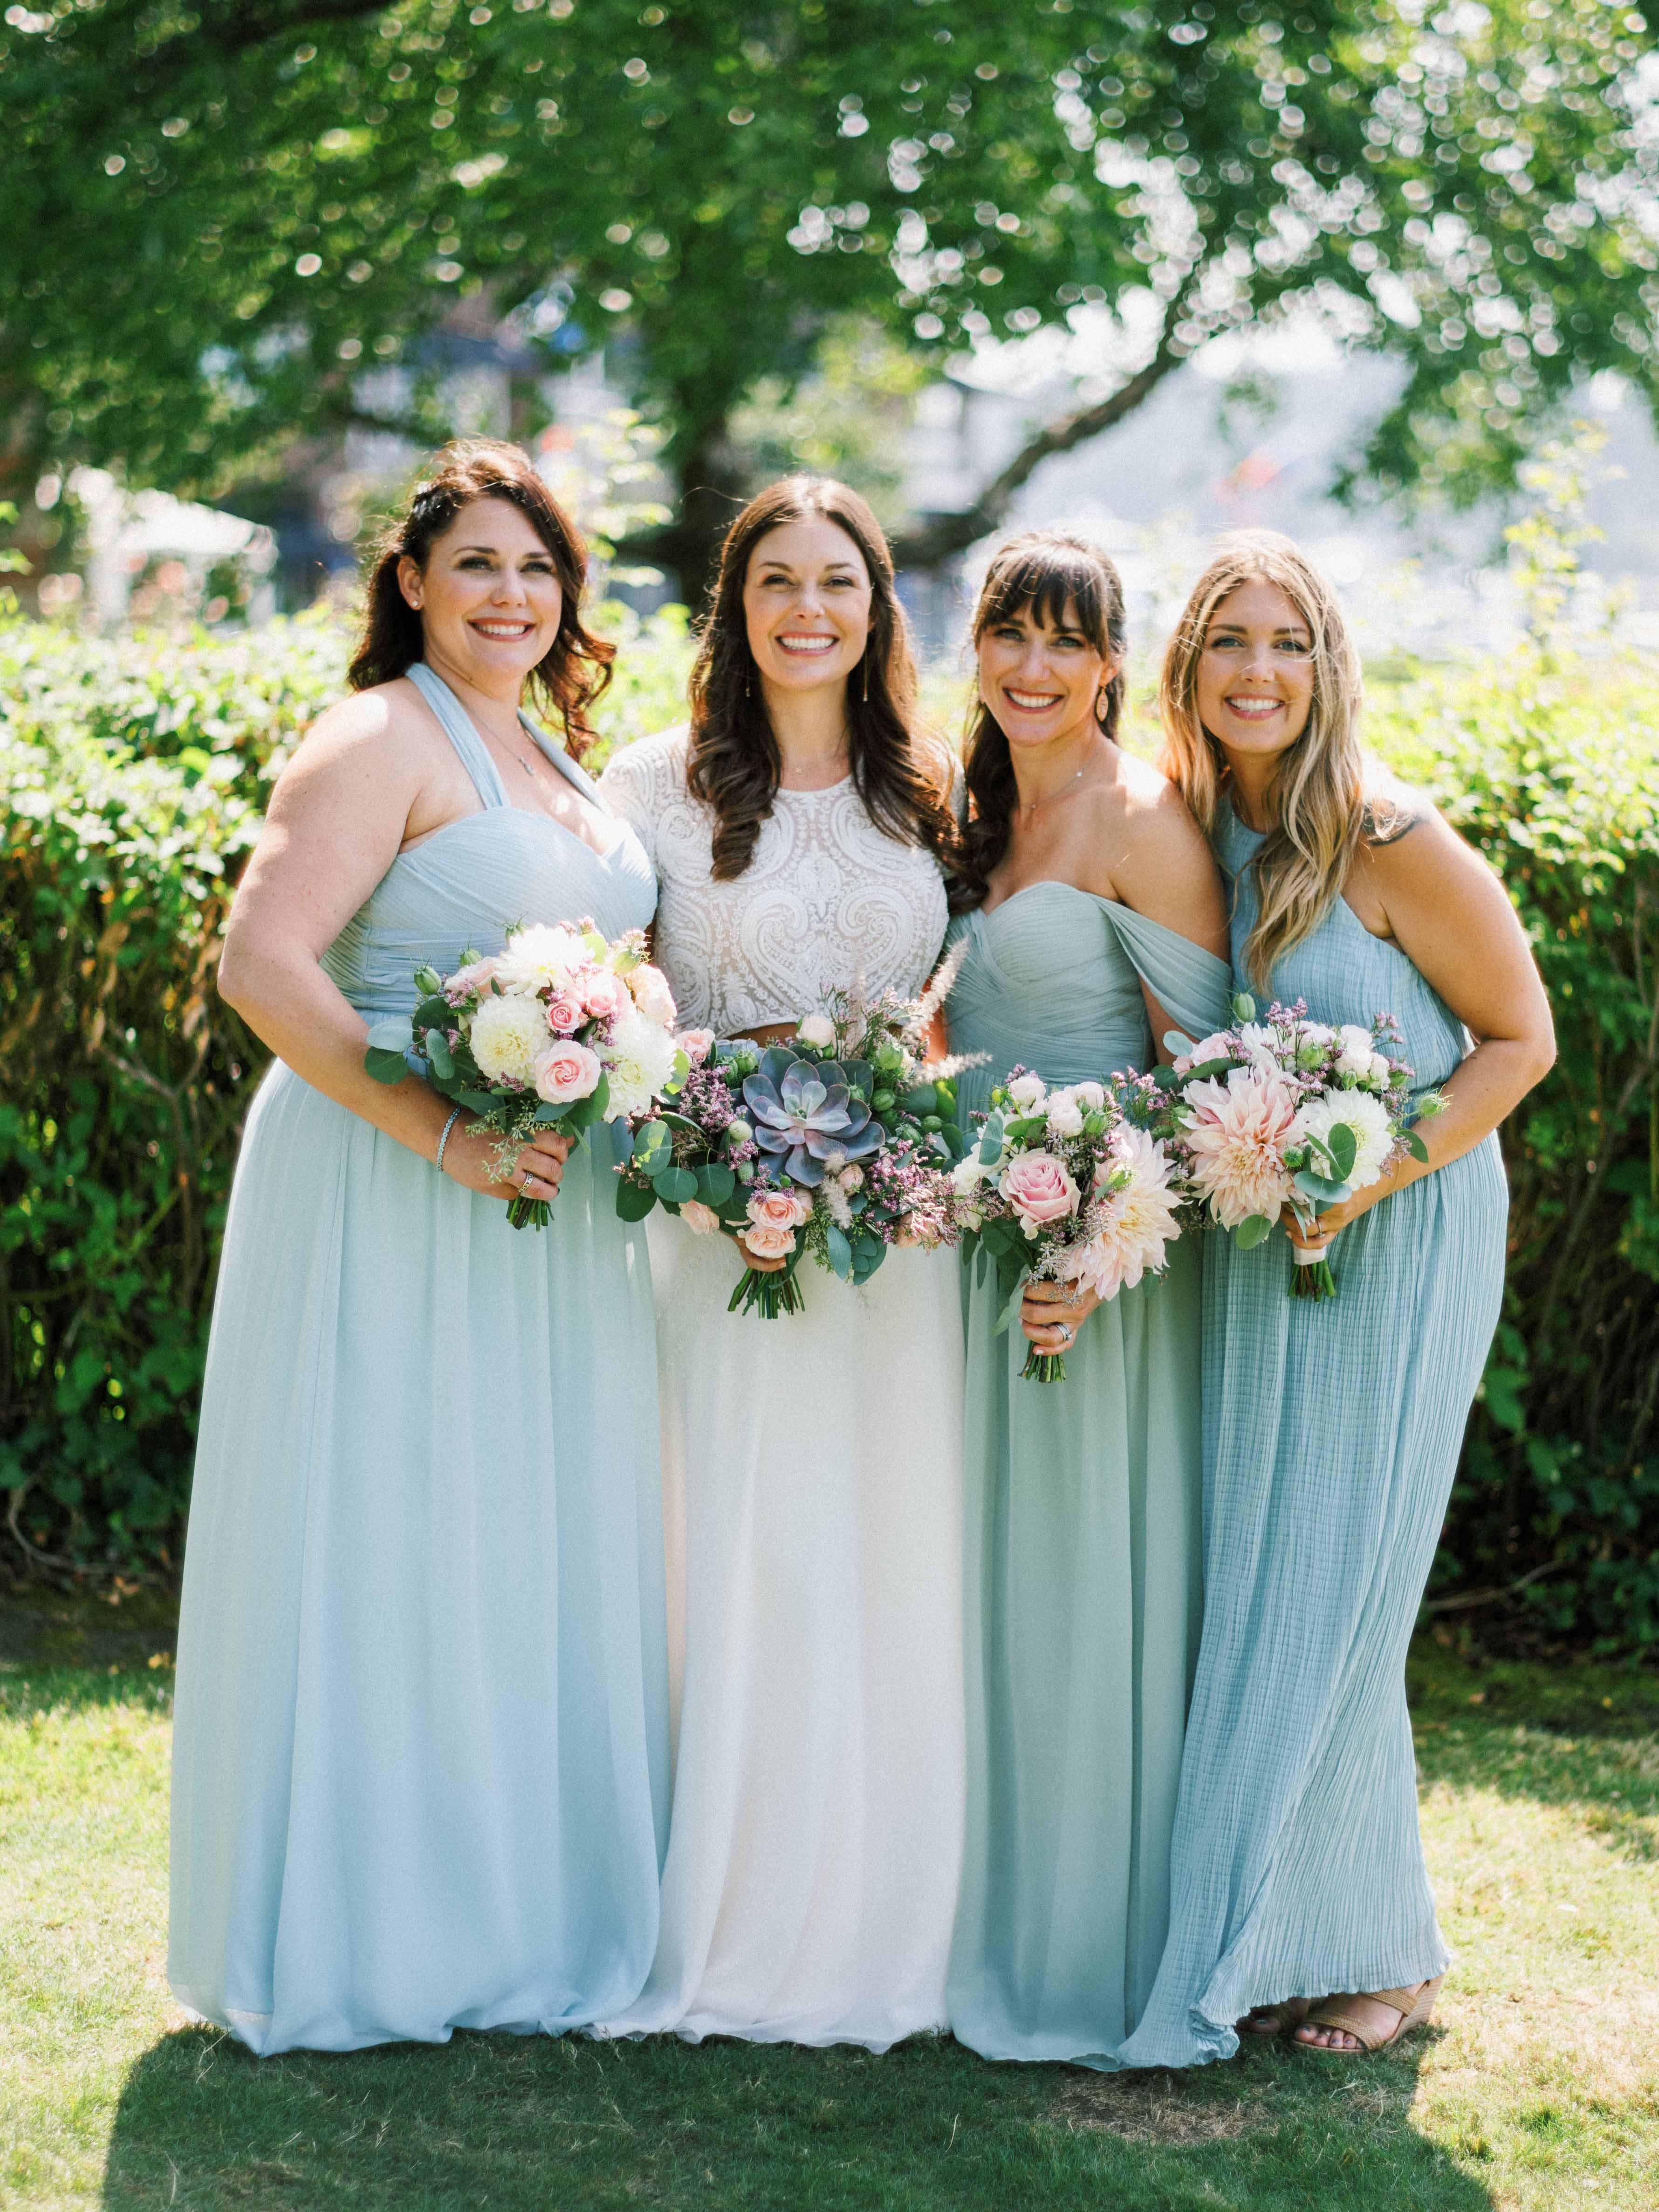 Bride with her bridesmaids - Woodmark Hotel Wedding by Flora Nova Design Seattle